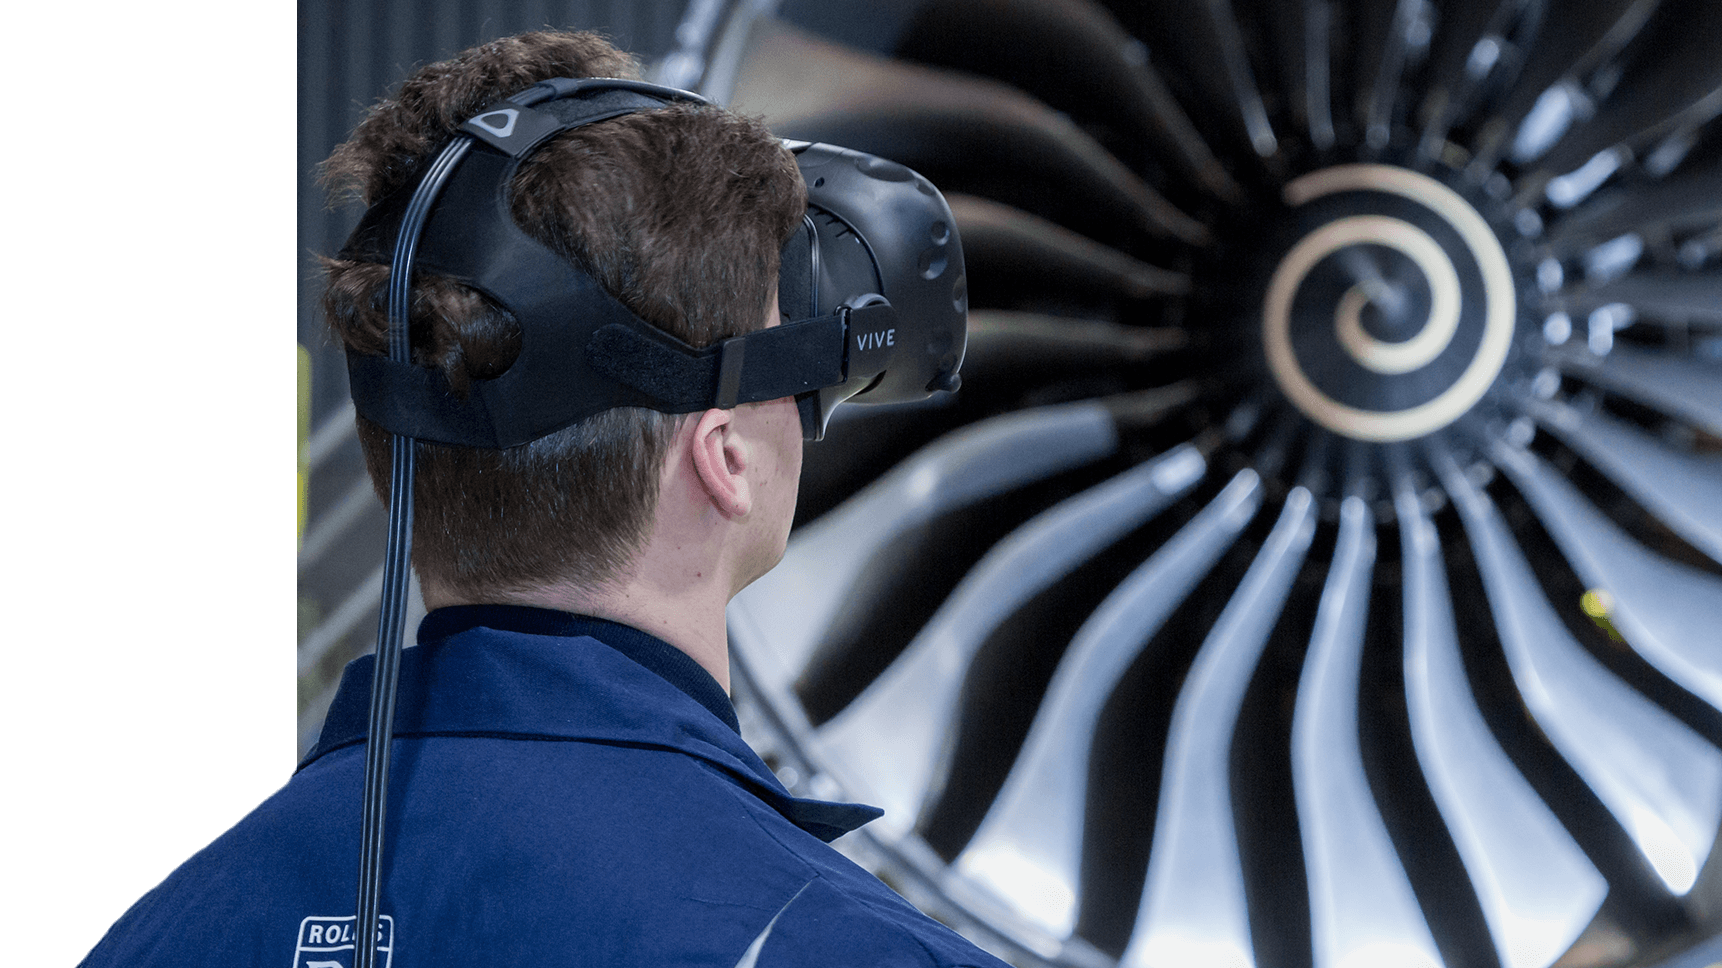 eee99ac1d72 Rolls-Royce Trent XWB engine